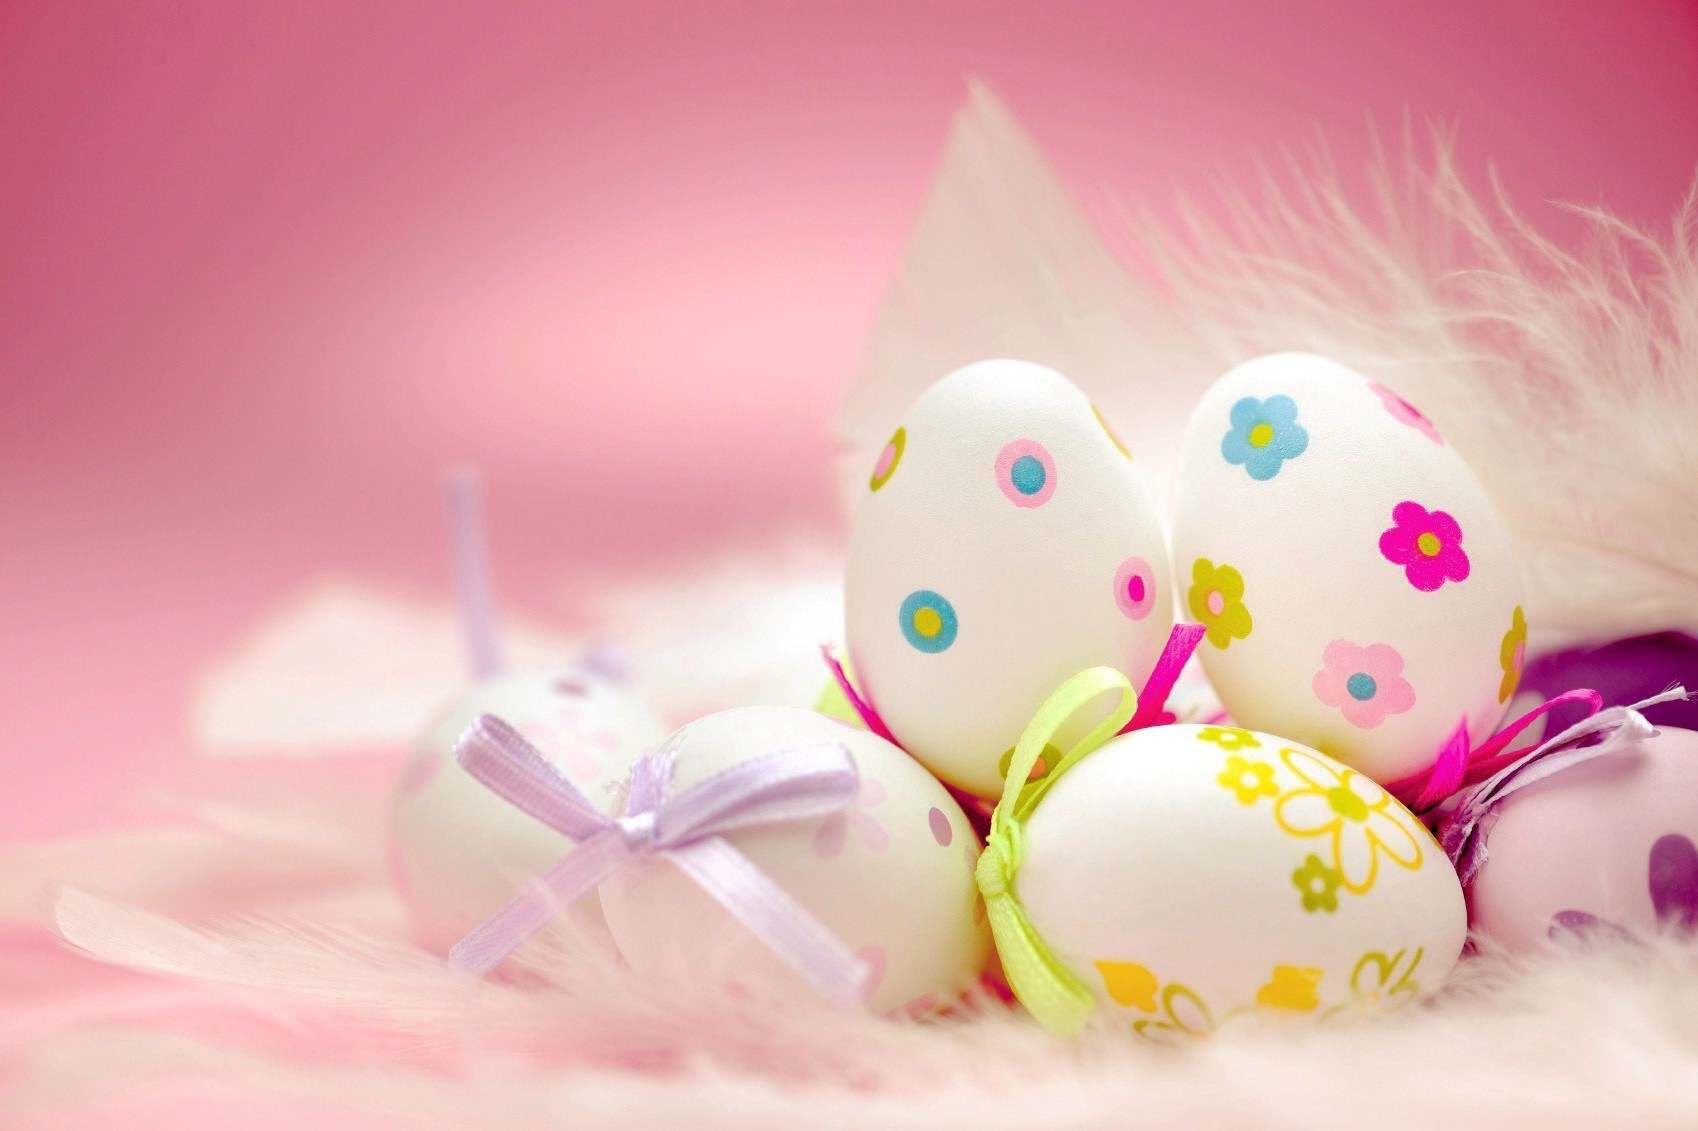 Easter Eggs Happy Easter Wallpaper Easter Wallpaper Easter Colors